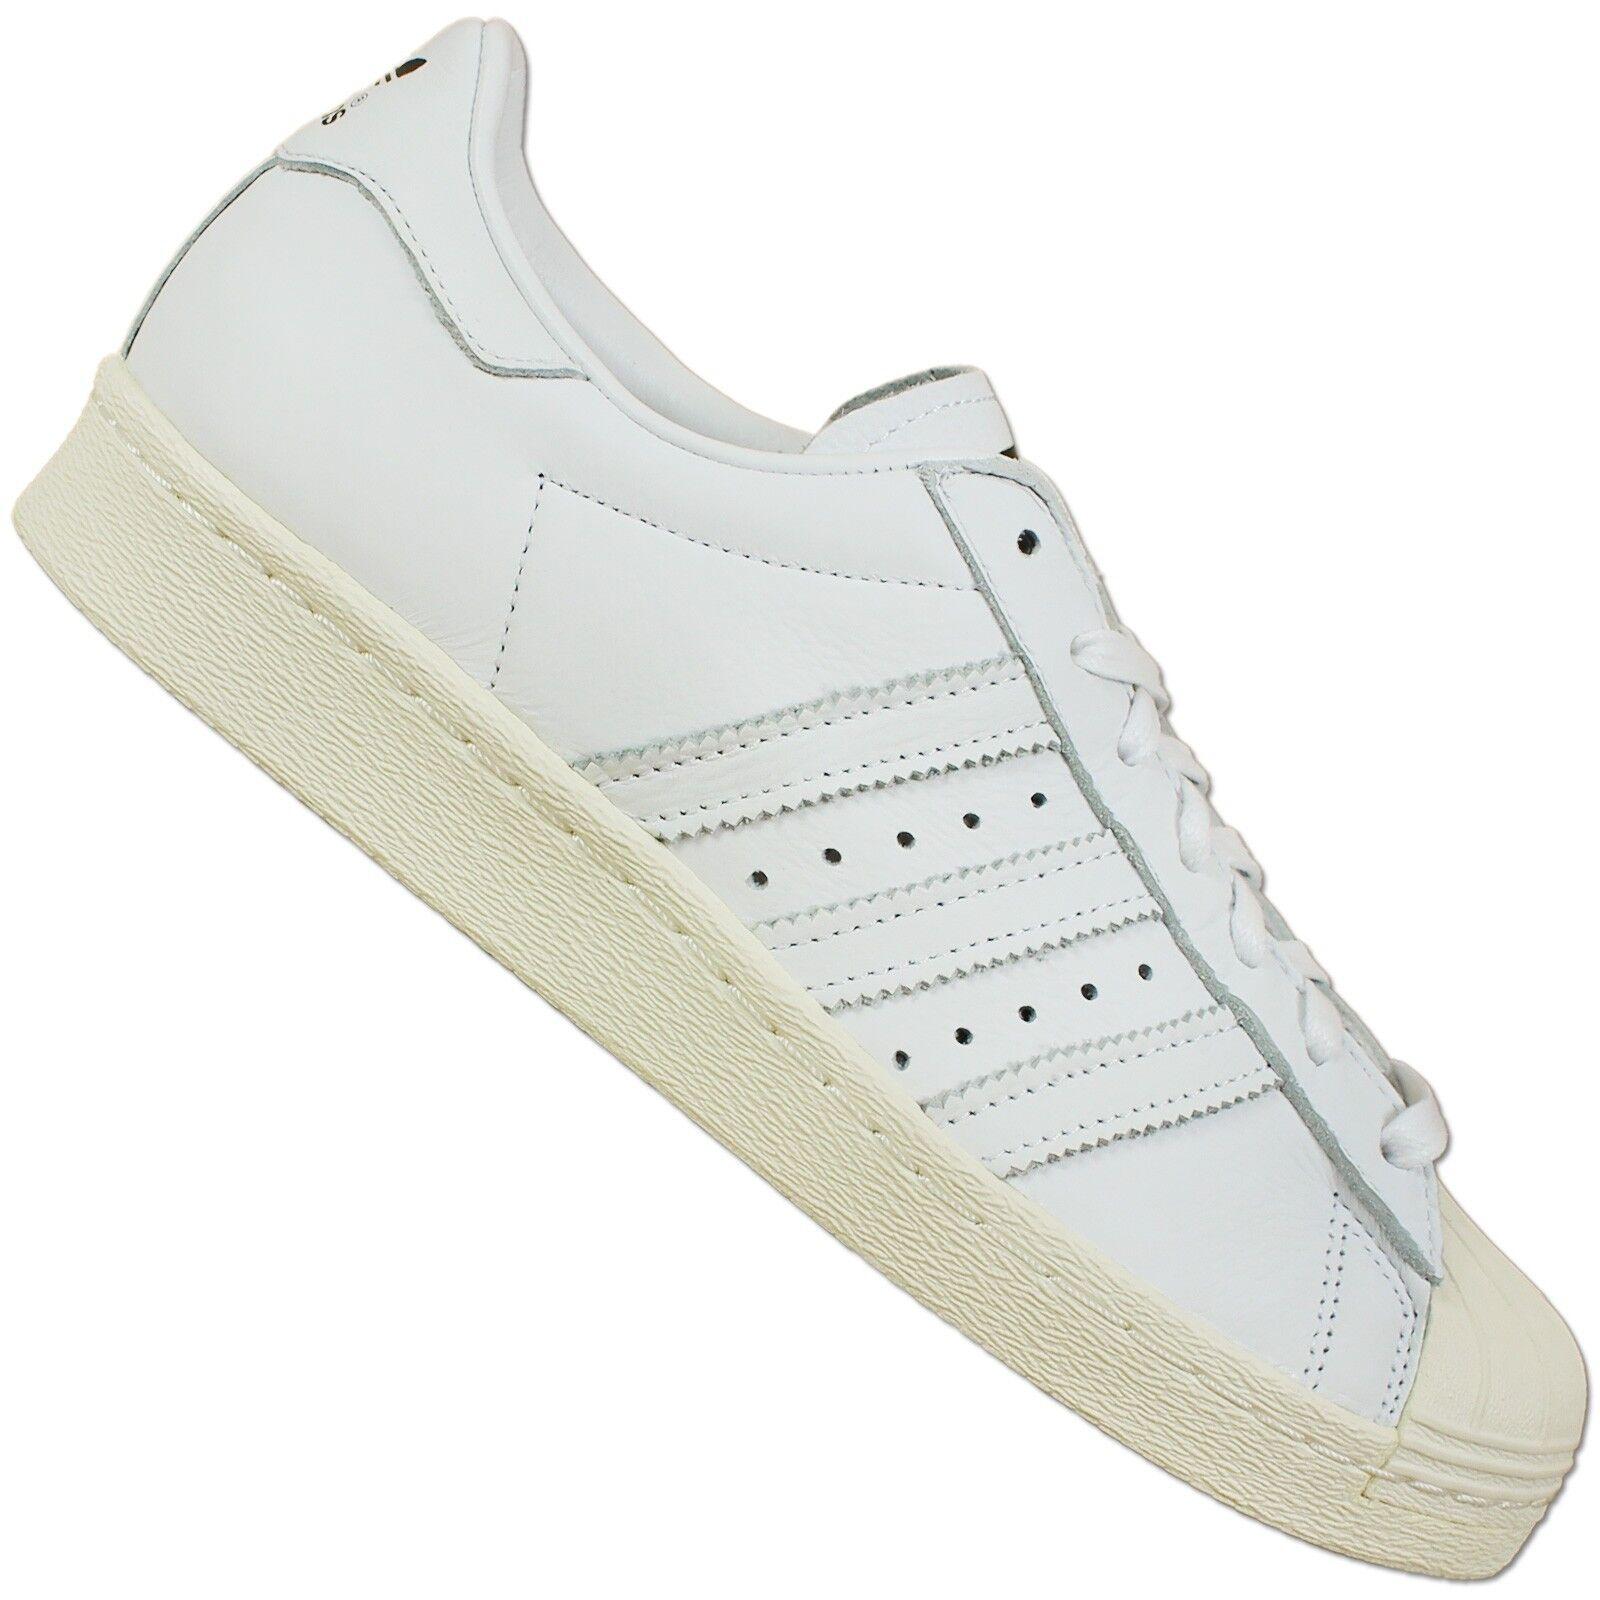 Adidas superstar 80 Deluxe Femmes Chaussure Basket Chaussures en Cuir Rétro Blanc 36 2/3 UK 4